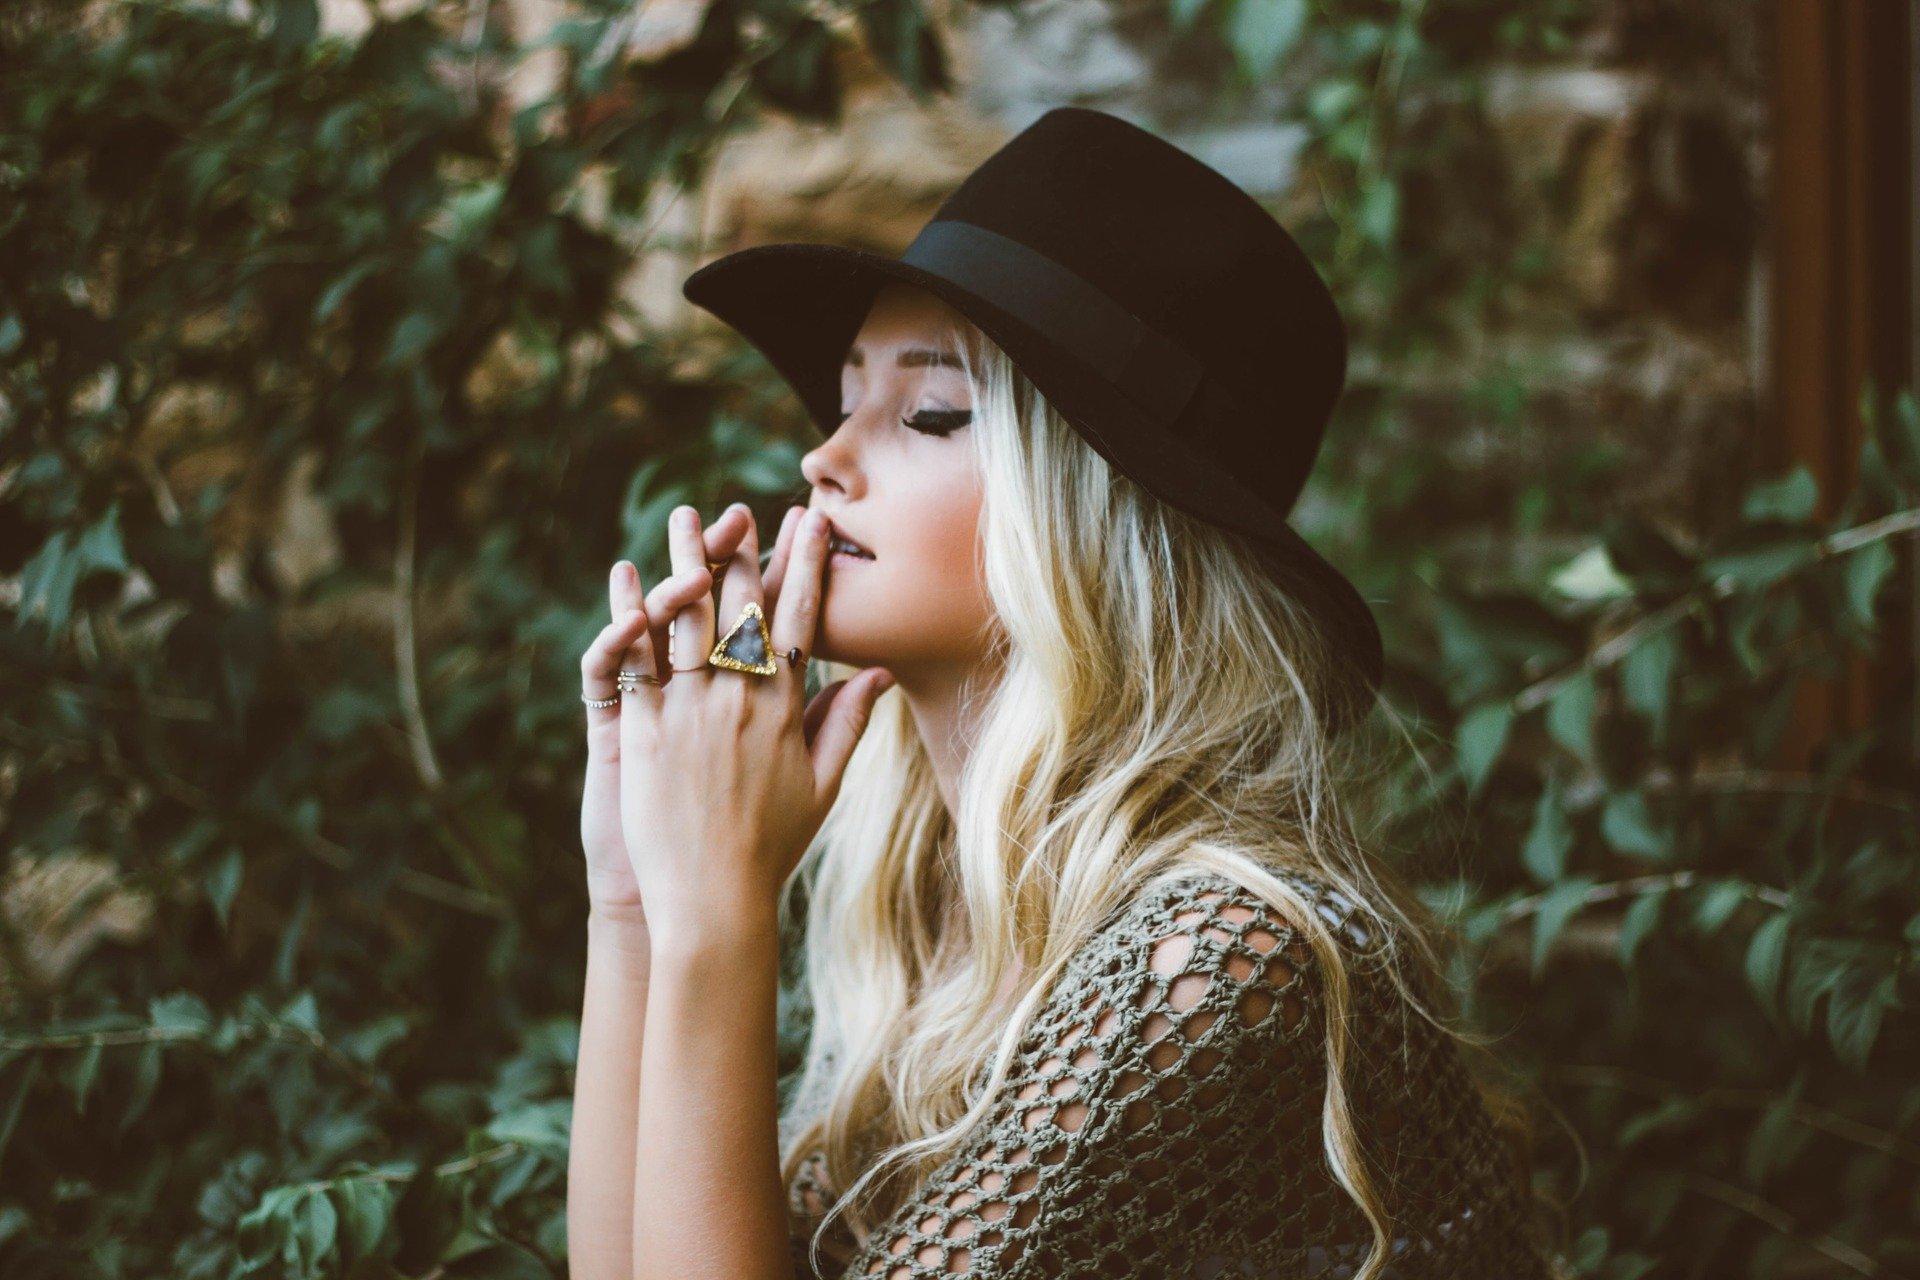 Haarfarben Trends 2020: Warme Blondtöne